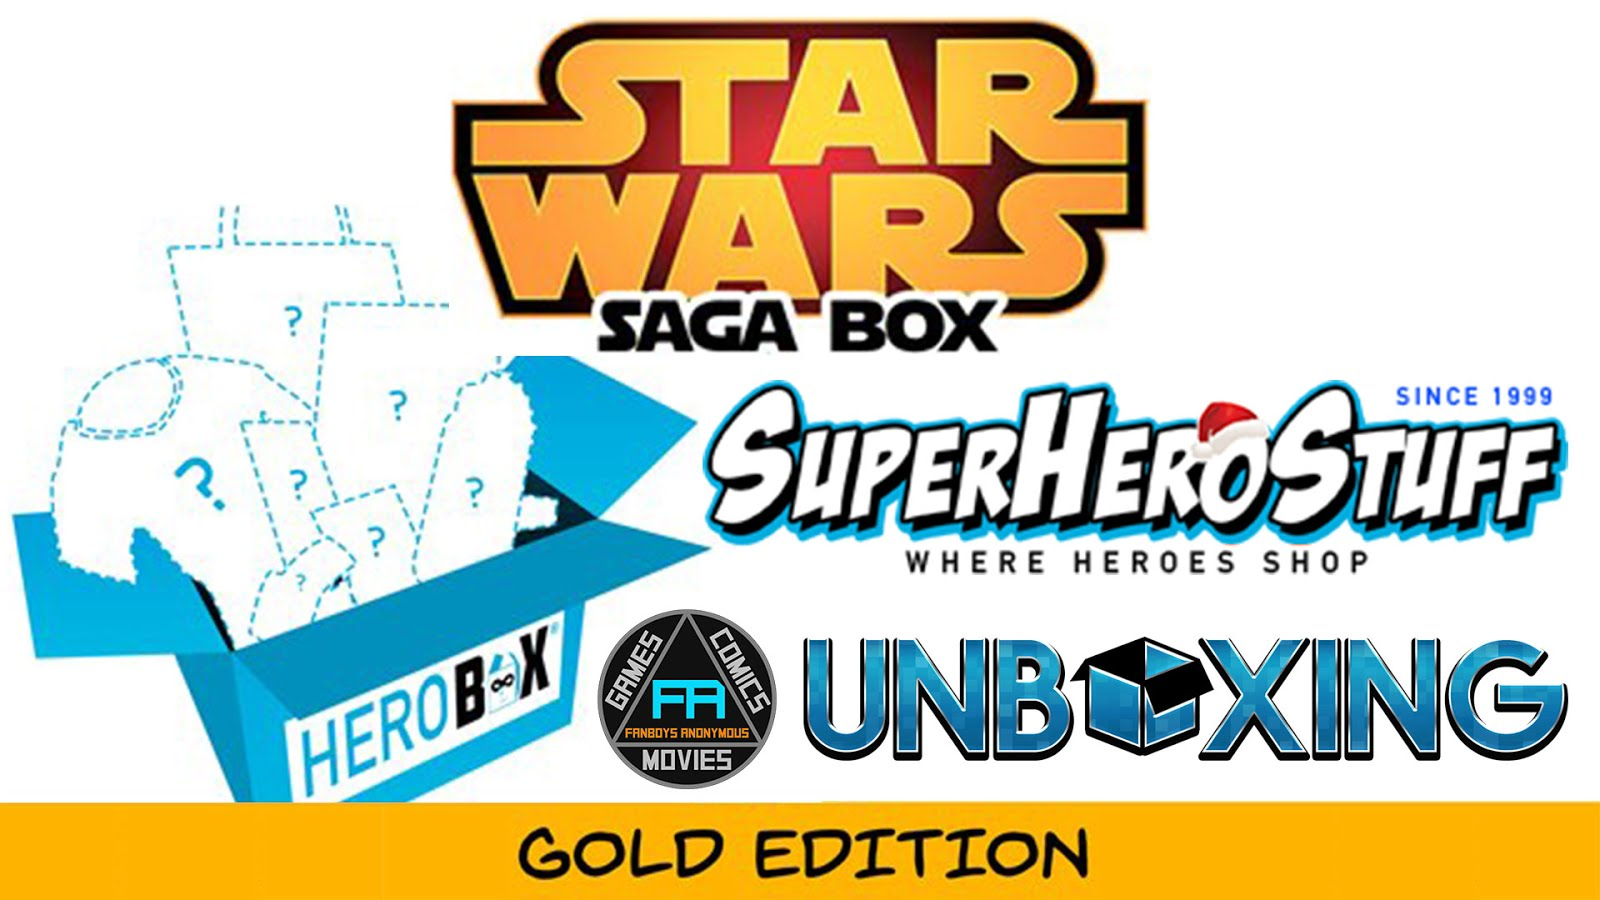 Star Wars Saga Box Gold Edition Unboxing Herobox SuperHeroStuff